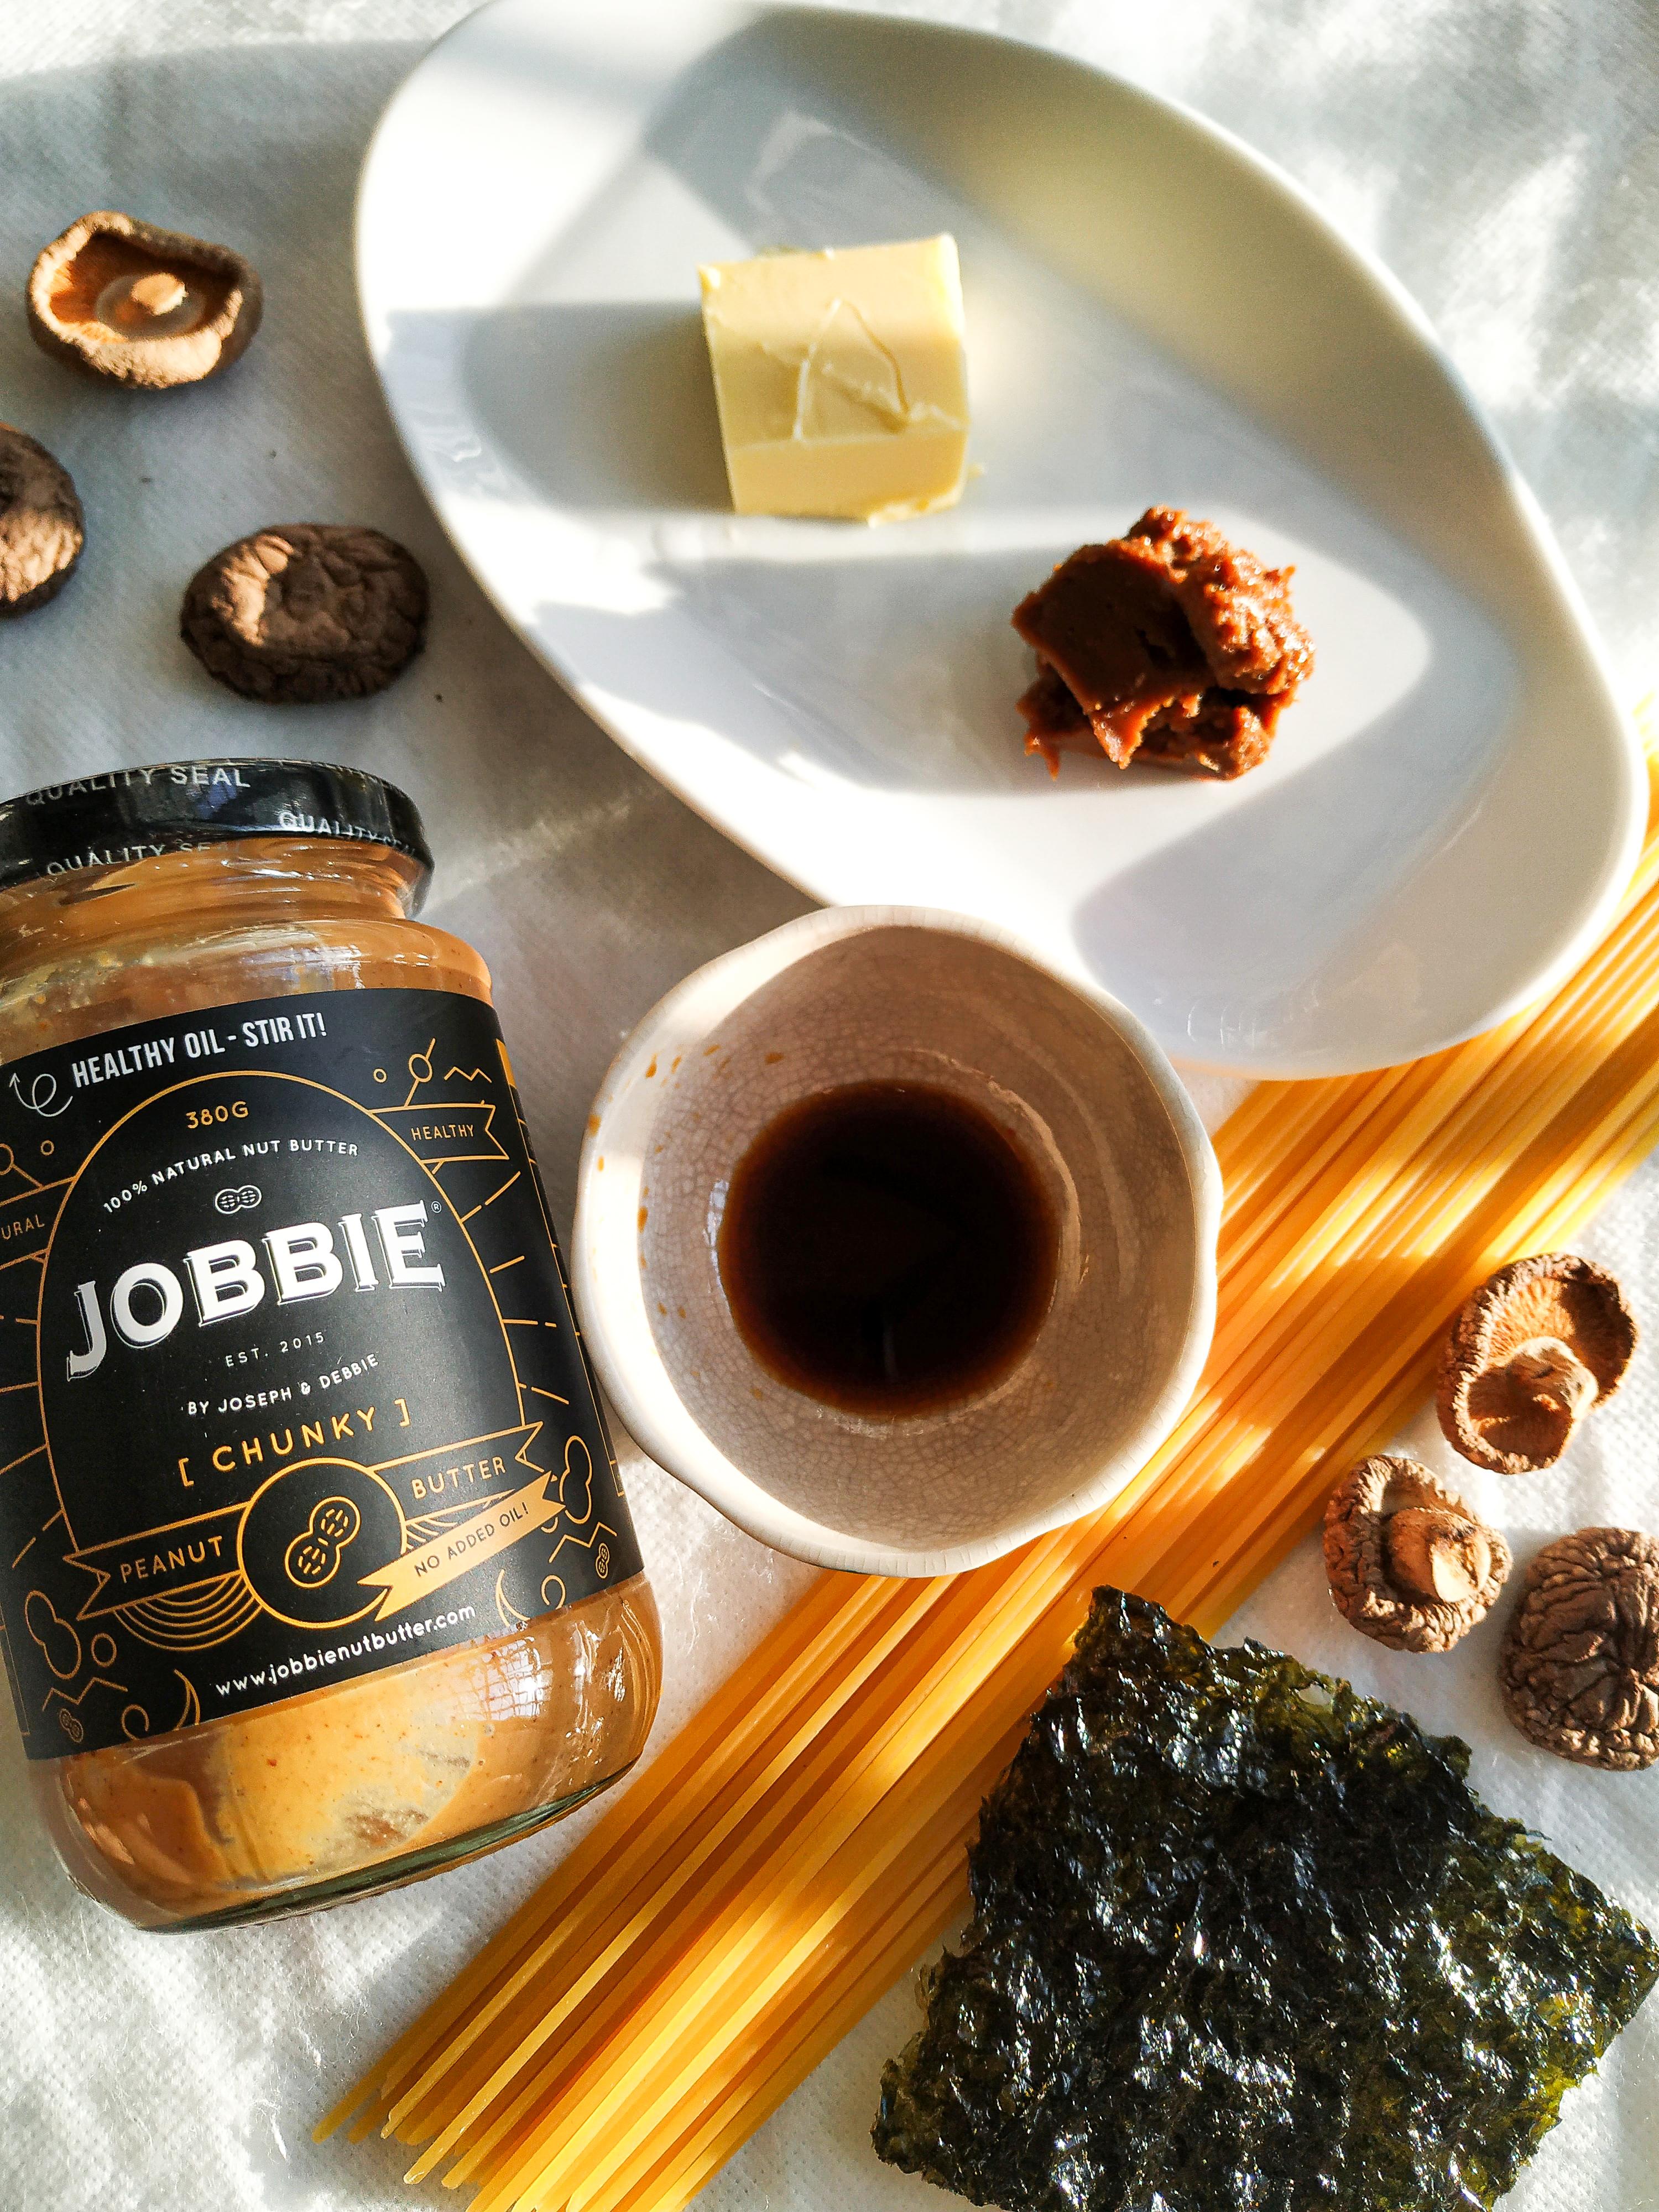 JOBBIE Peanut Butter Miso Pasta